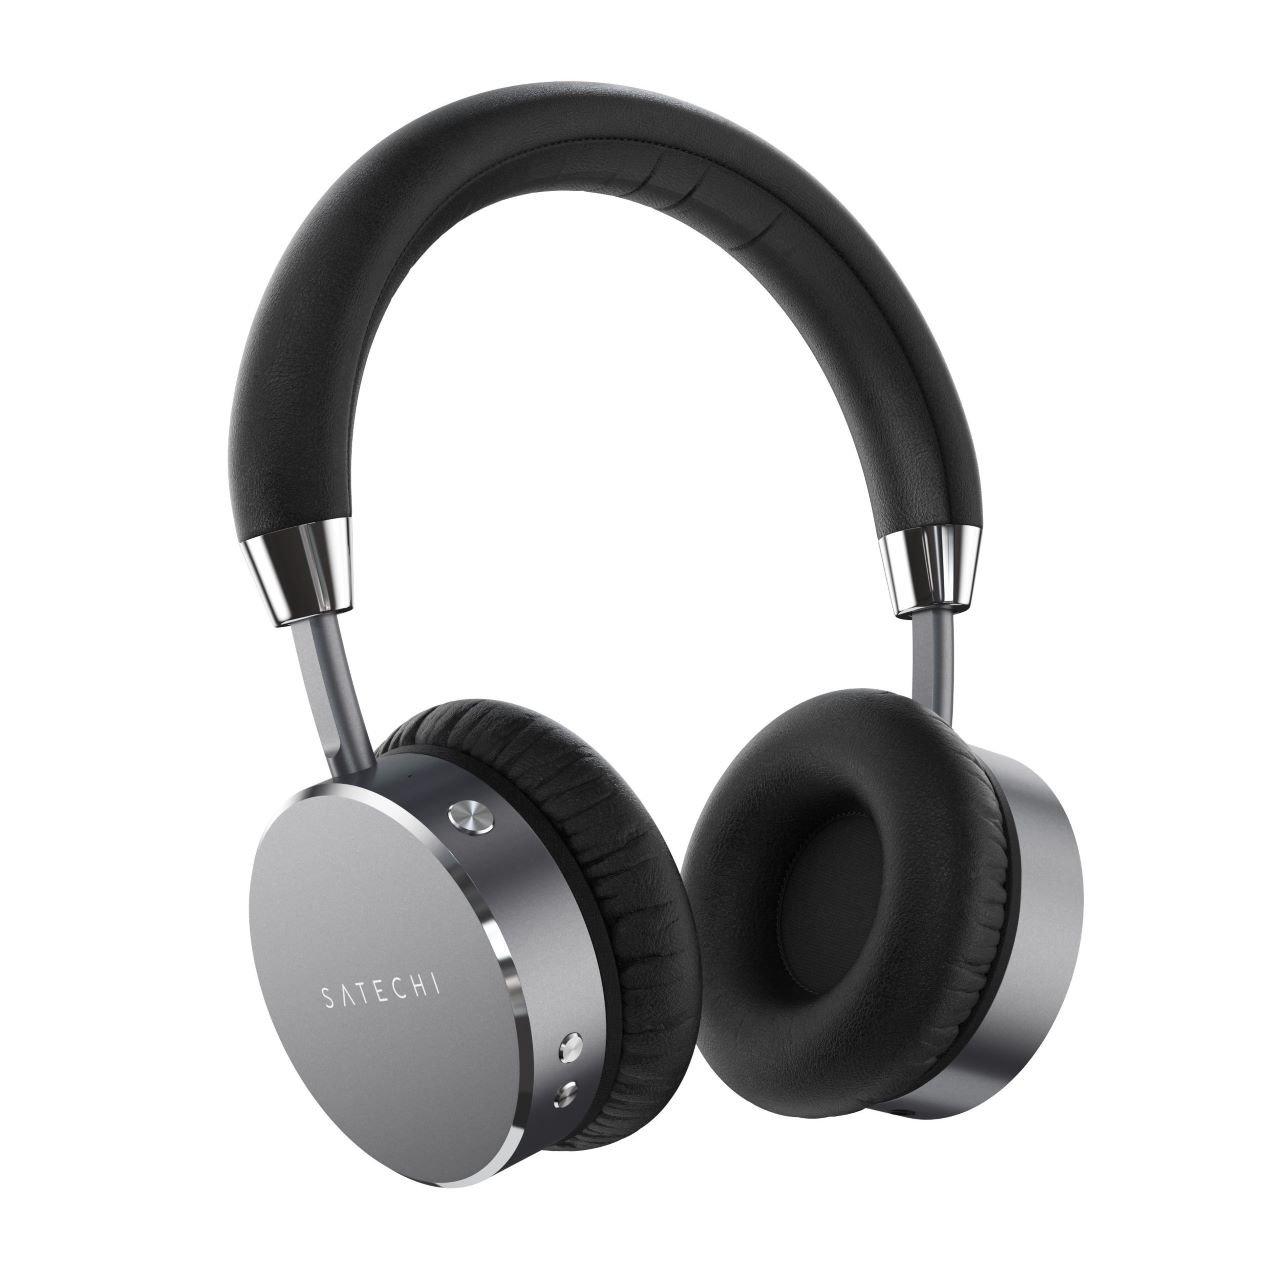 Satechi Aluminum Headphones Wireless Space Grau ST-AHPM